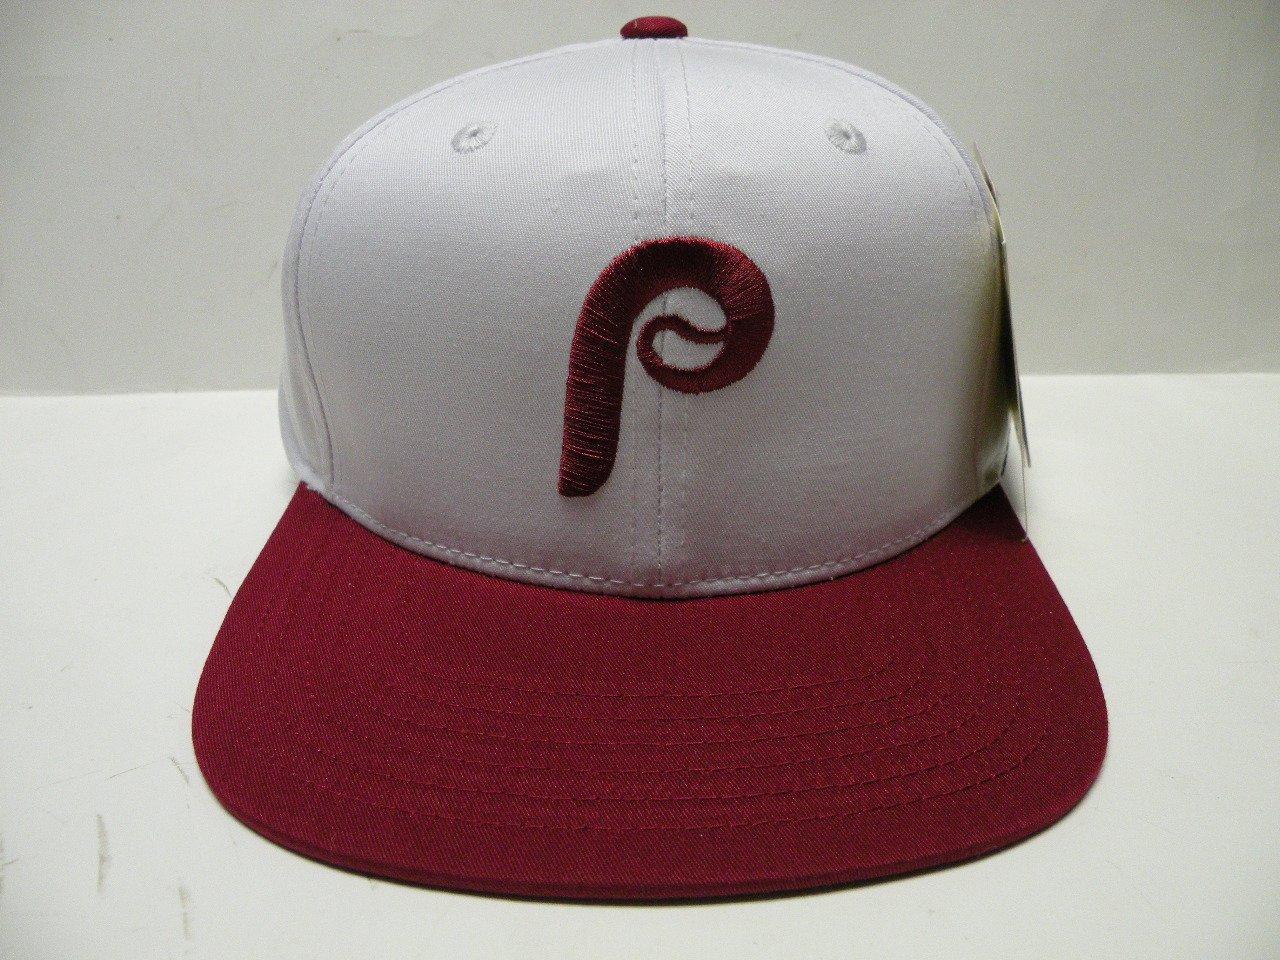 Buy Vintage Philadelphia Phillies Sports Specialties snapback hat ... 8041255c3cc8